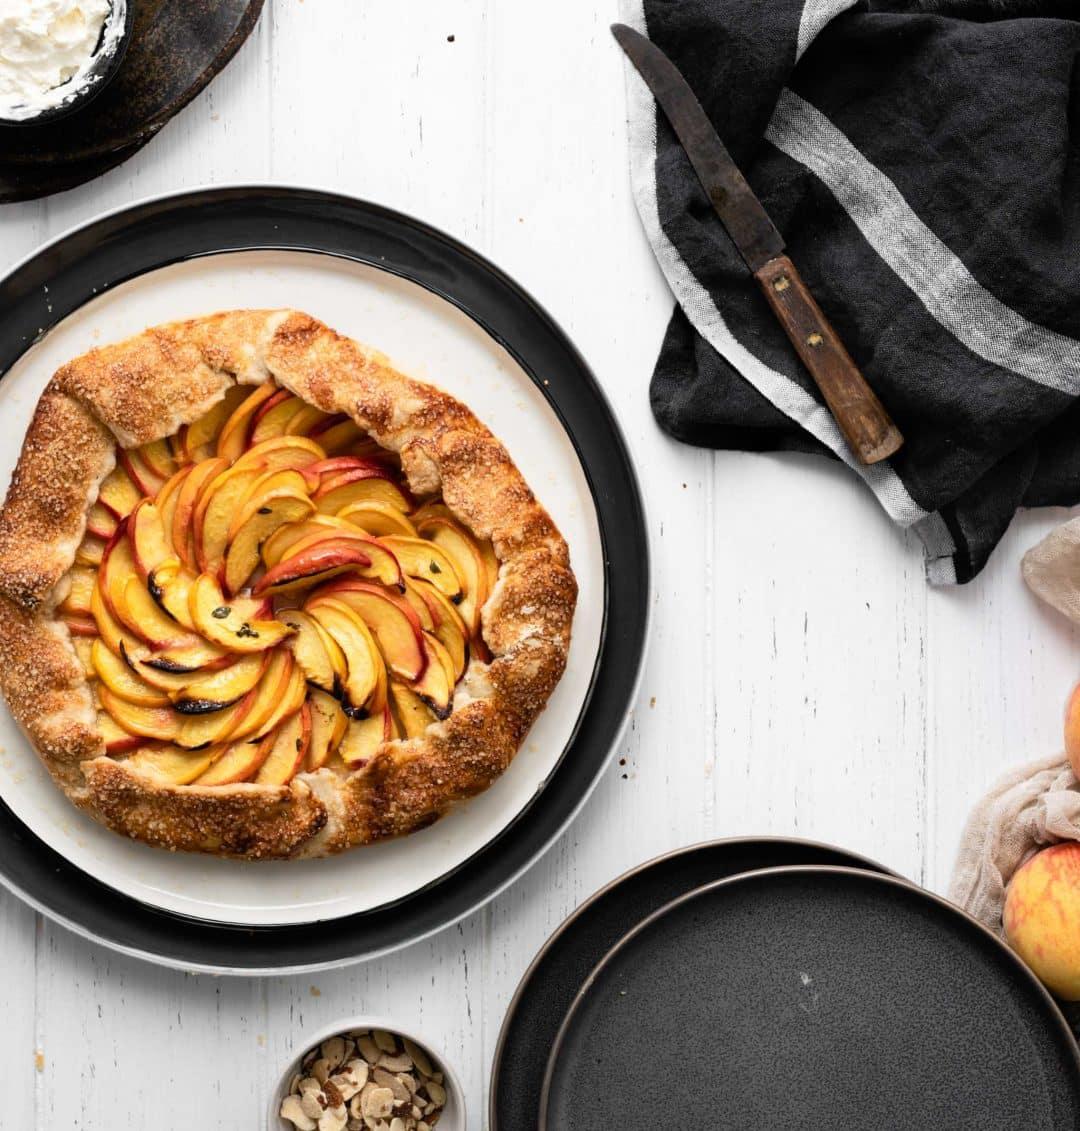 bakes lemon thyme peach galette